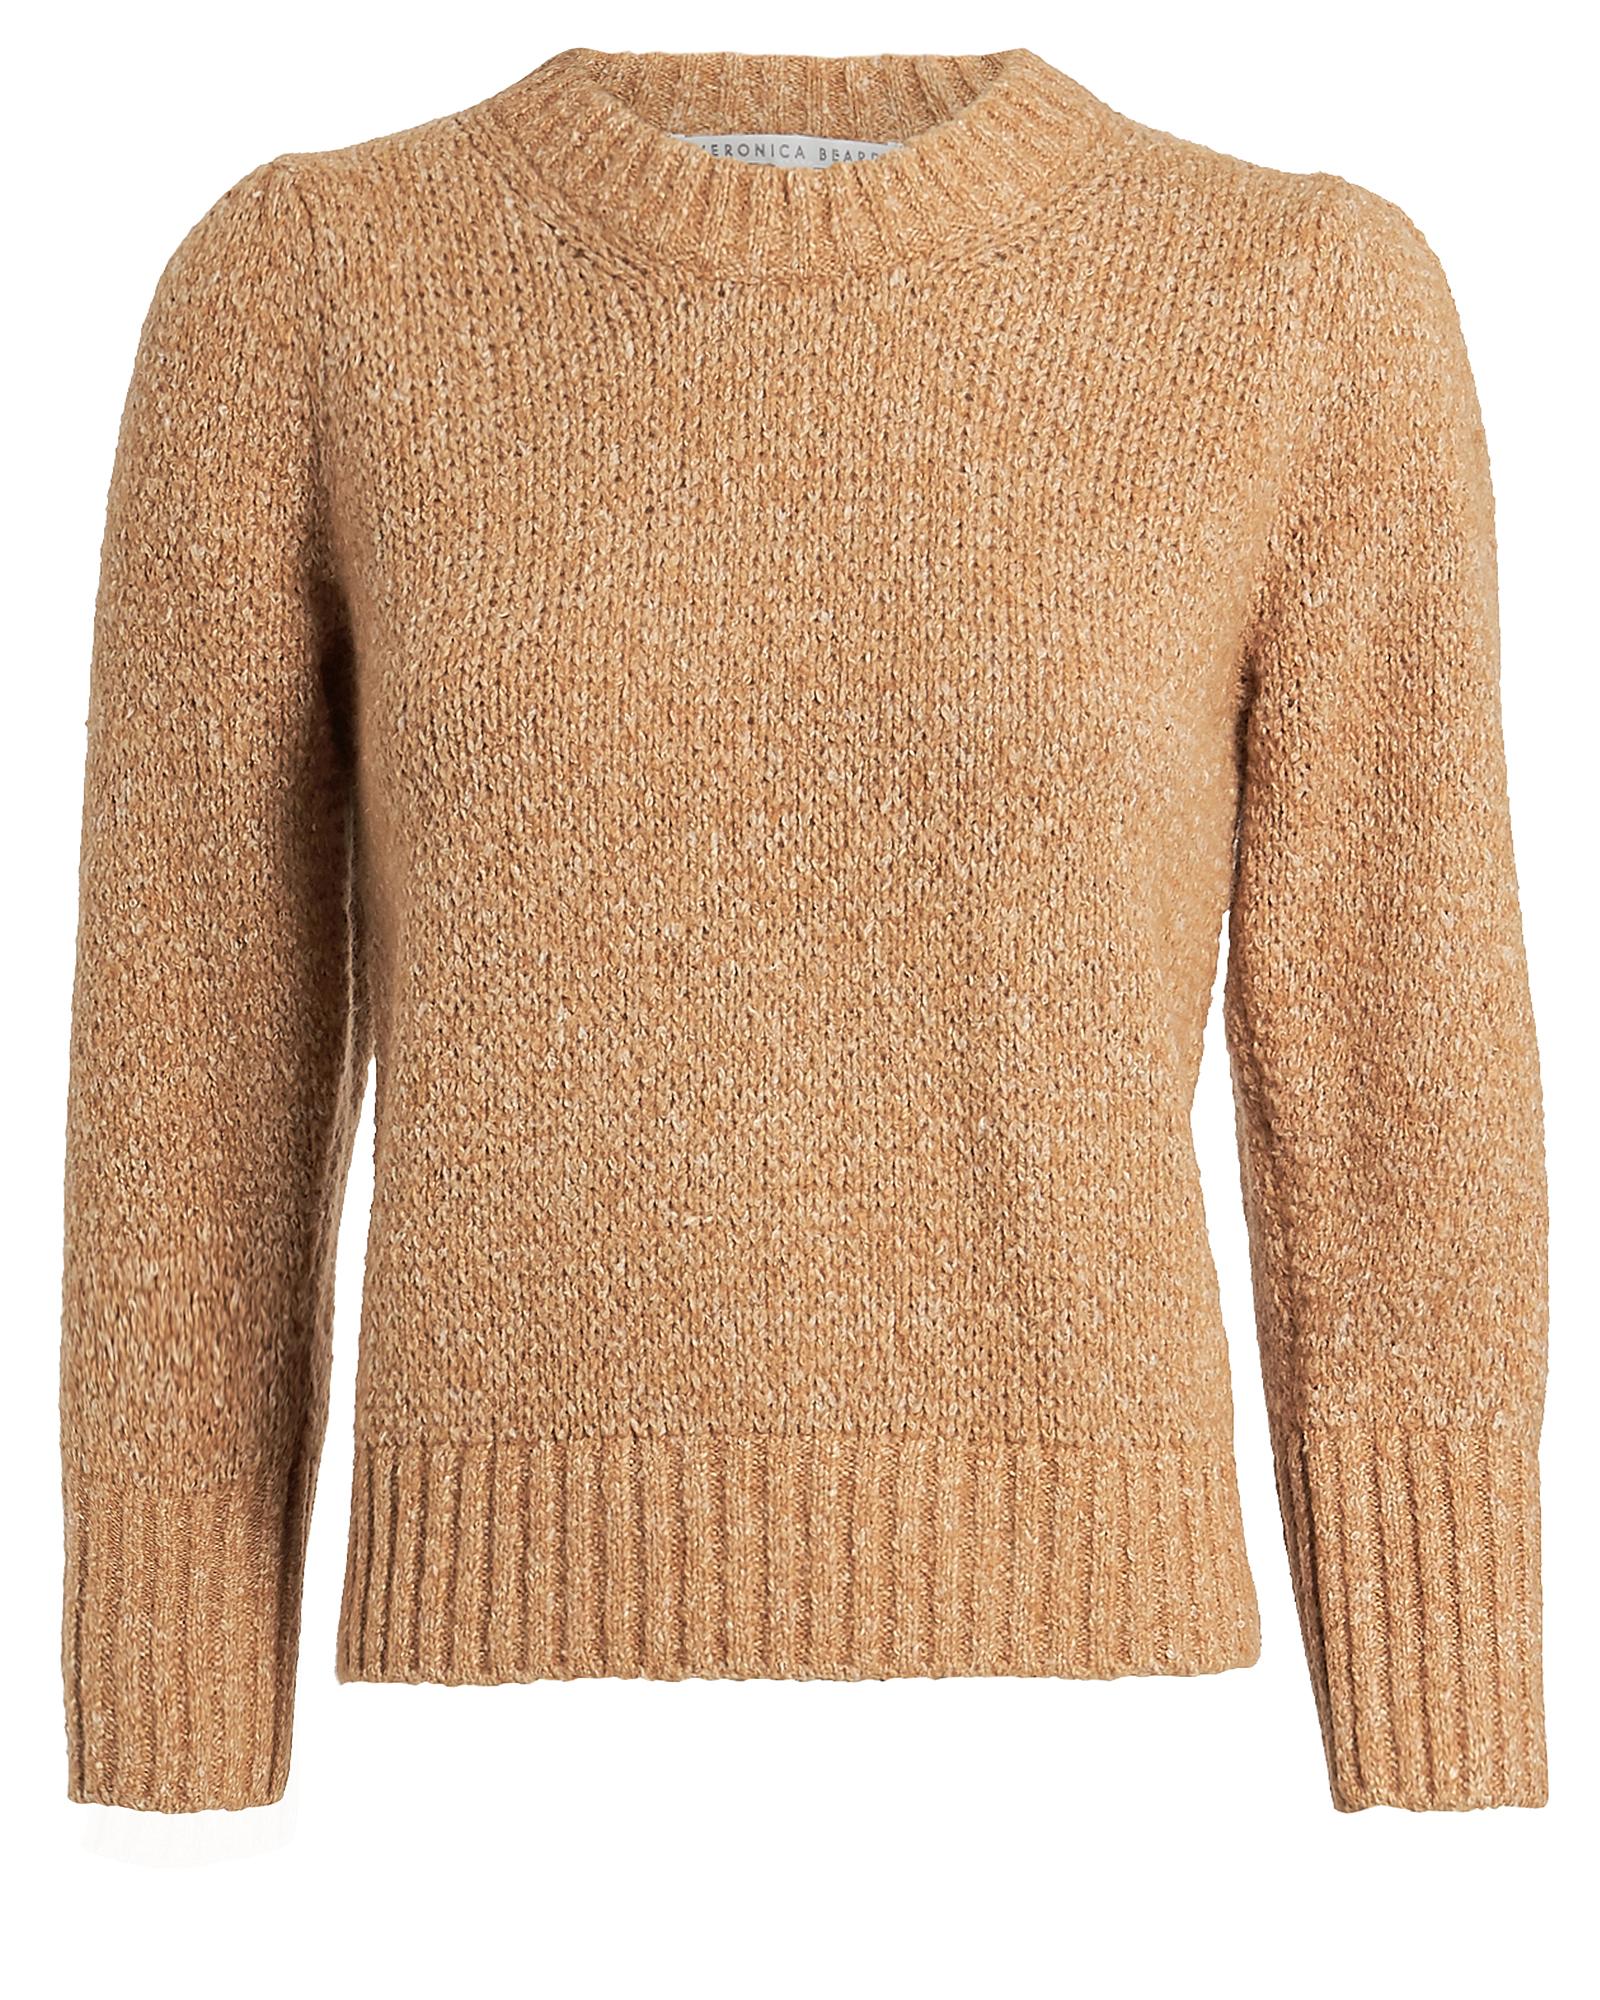 Veronica Beard Sweaters VERONICA BEARD HOLLY COTTON & WOOL-BLEND SWEATER